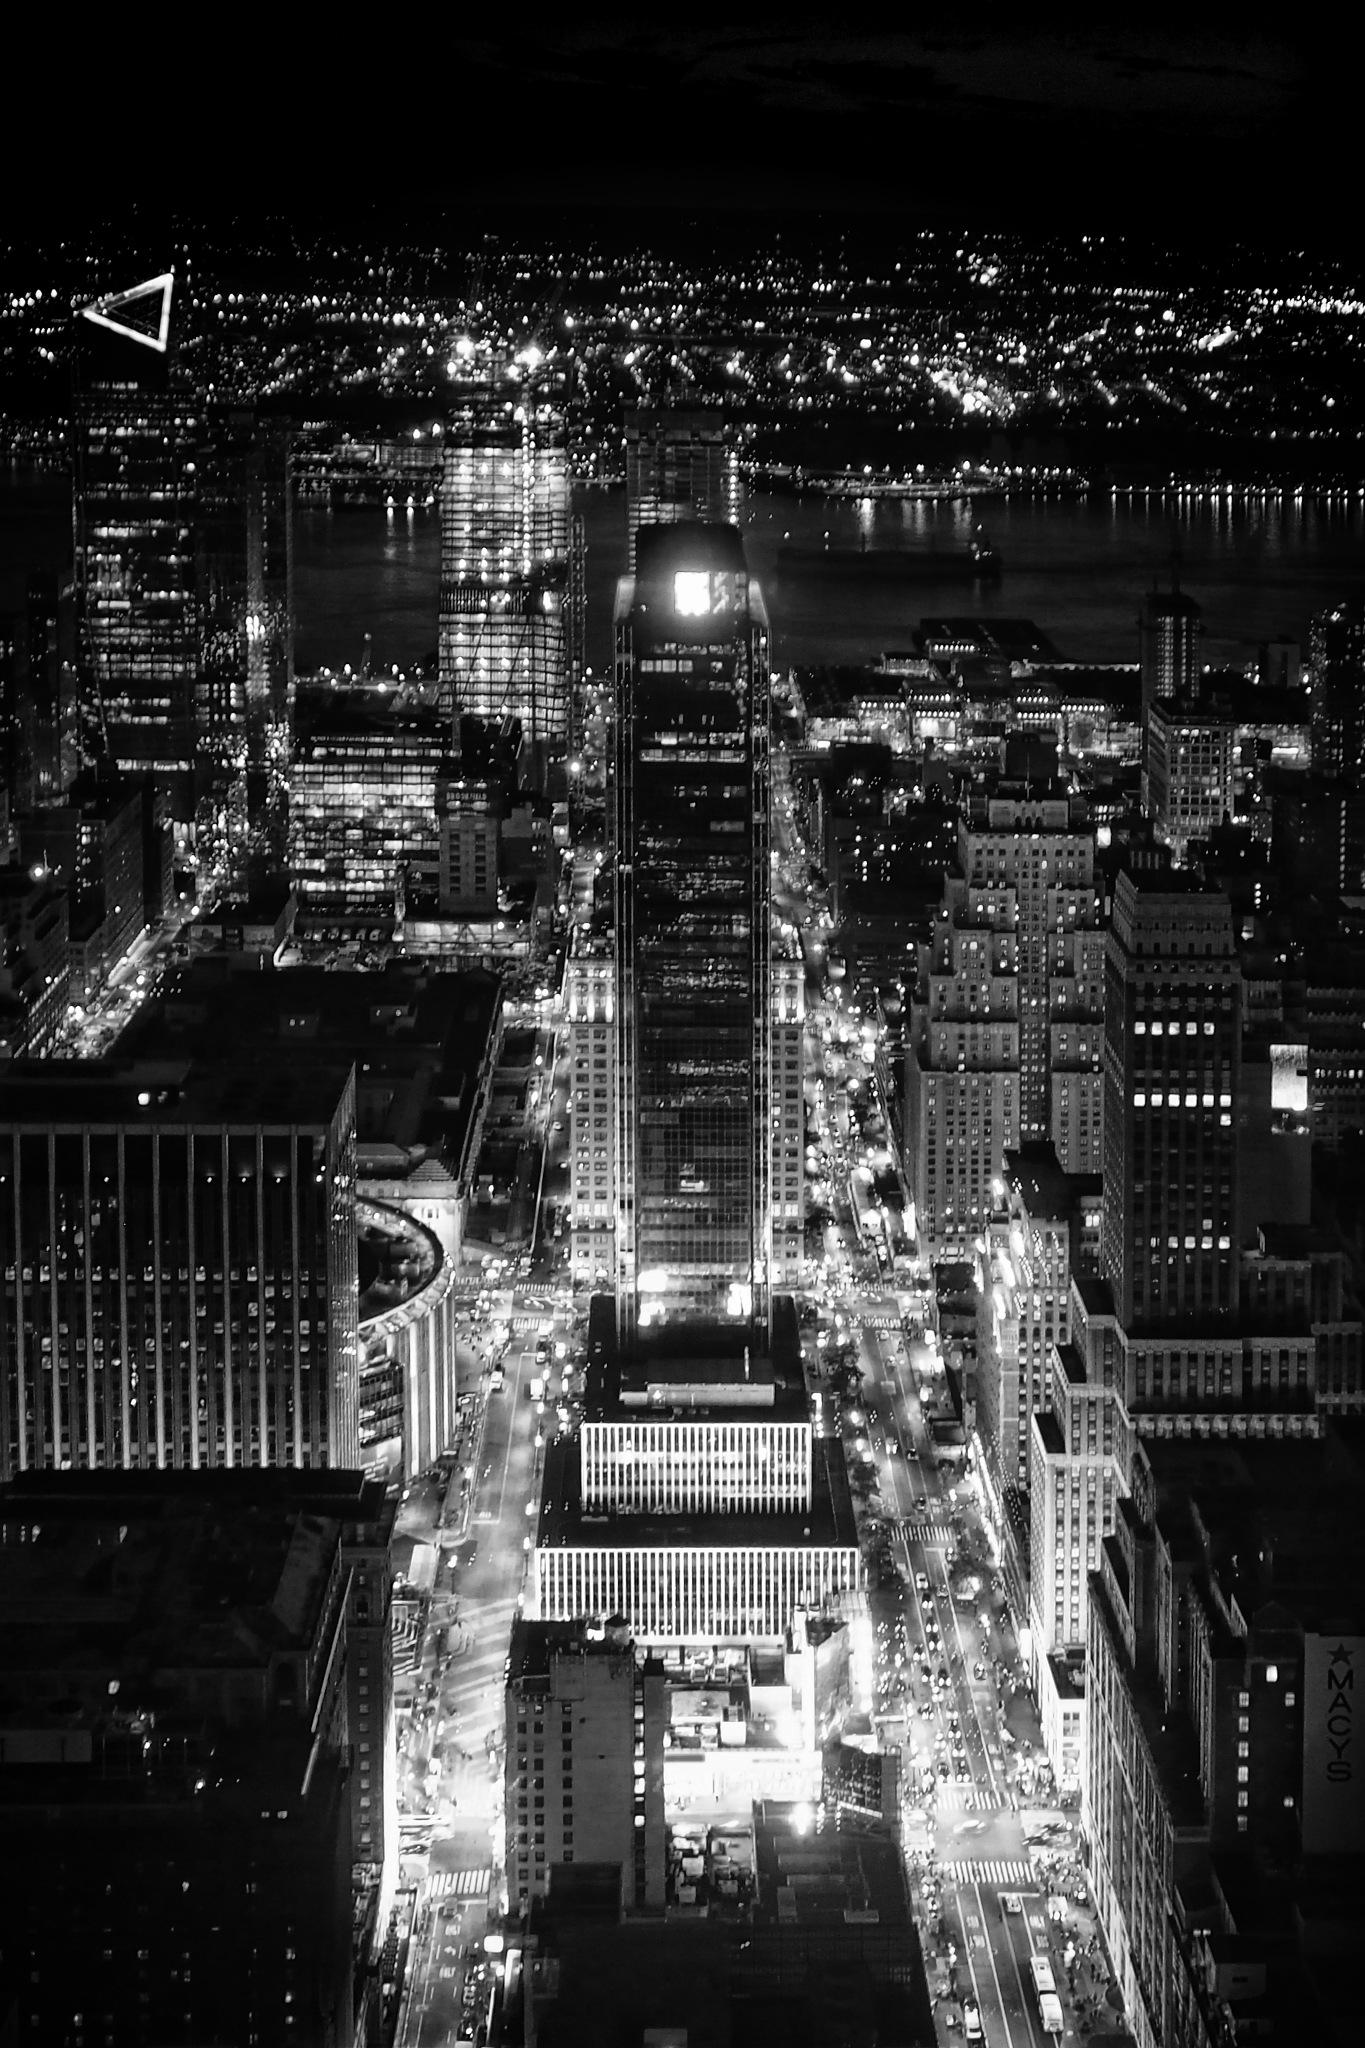 NYC IN THE DARK by David DeBord